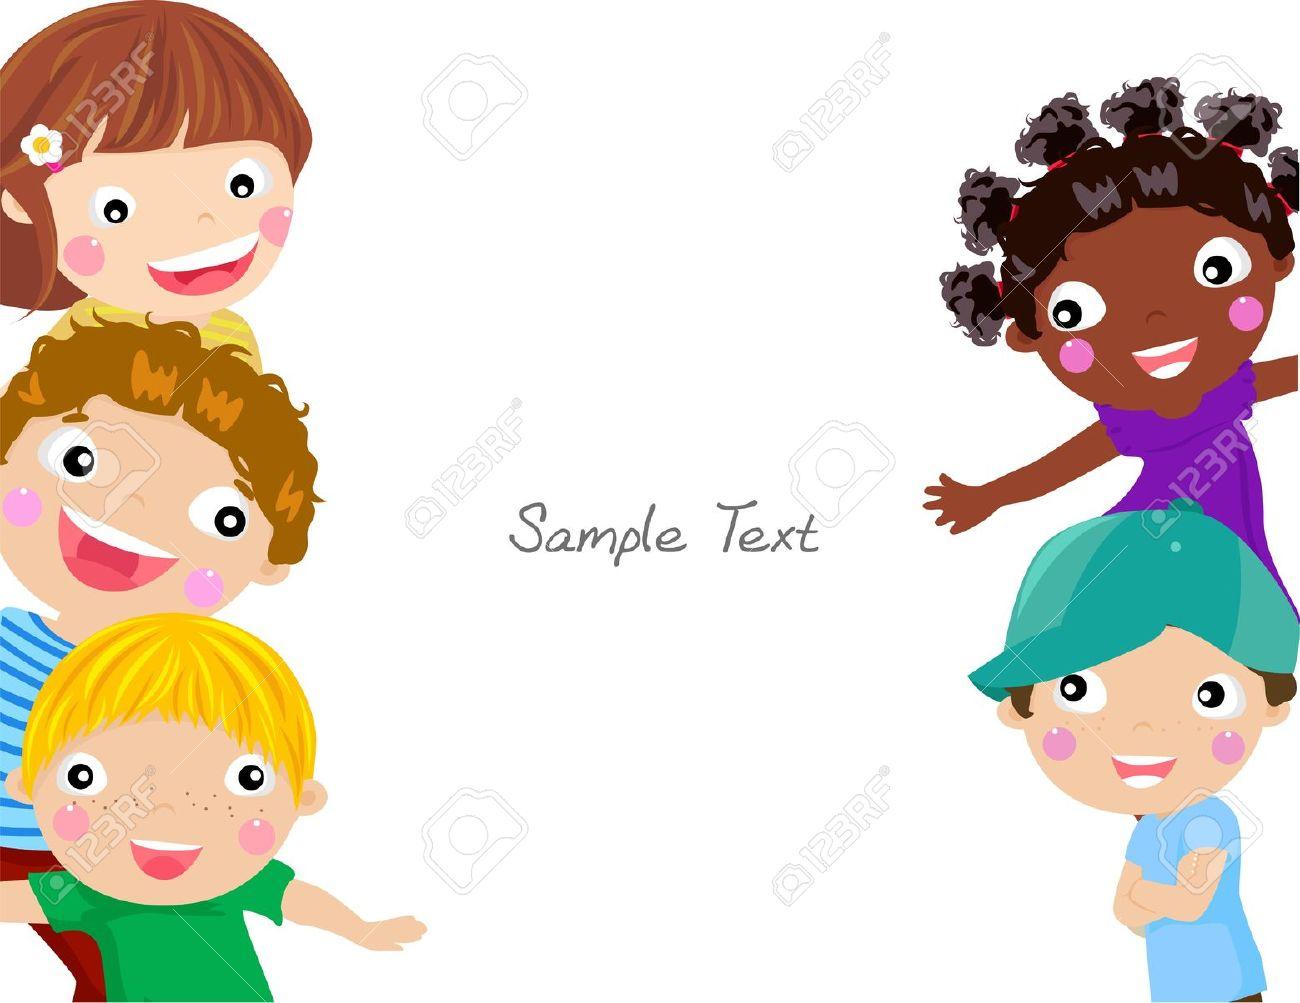 School kids character clipart svg library download playkids cartoons for kids screenshot. cartoon kids stock ... svg library download